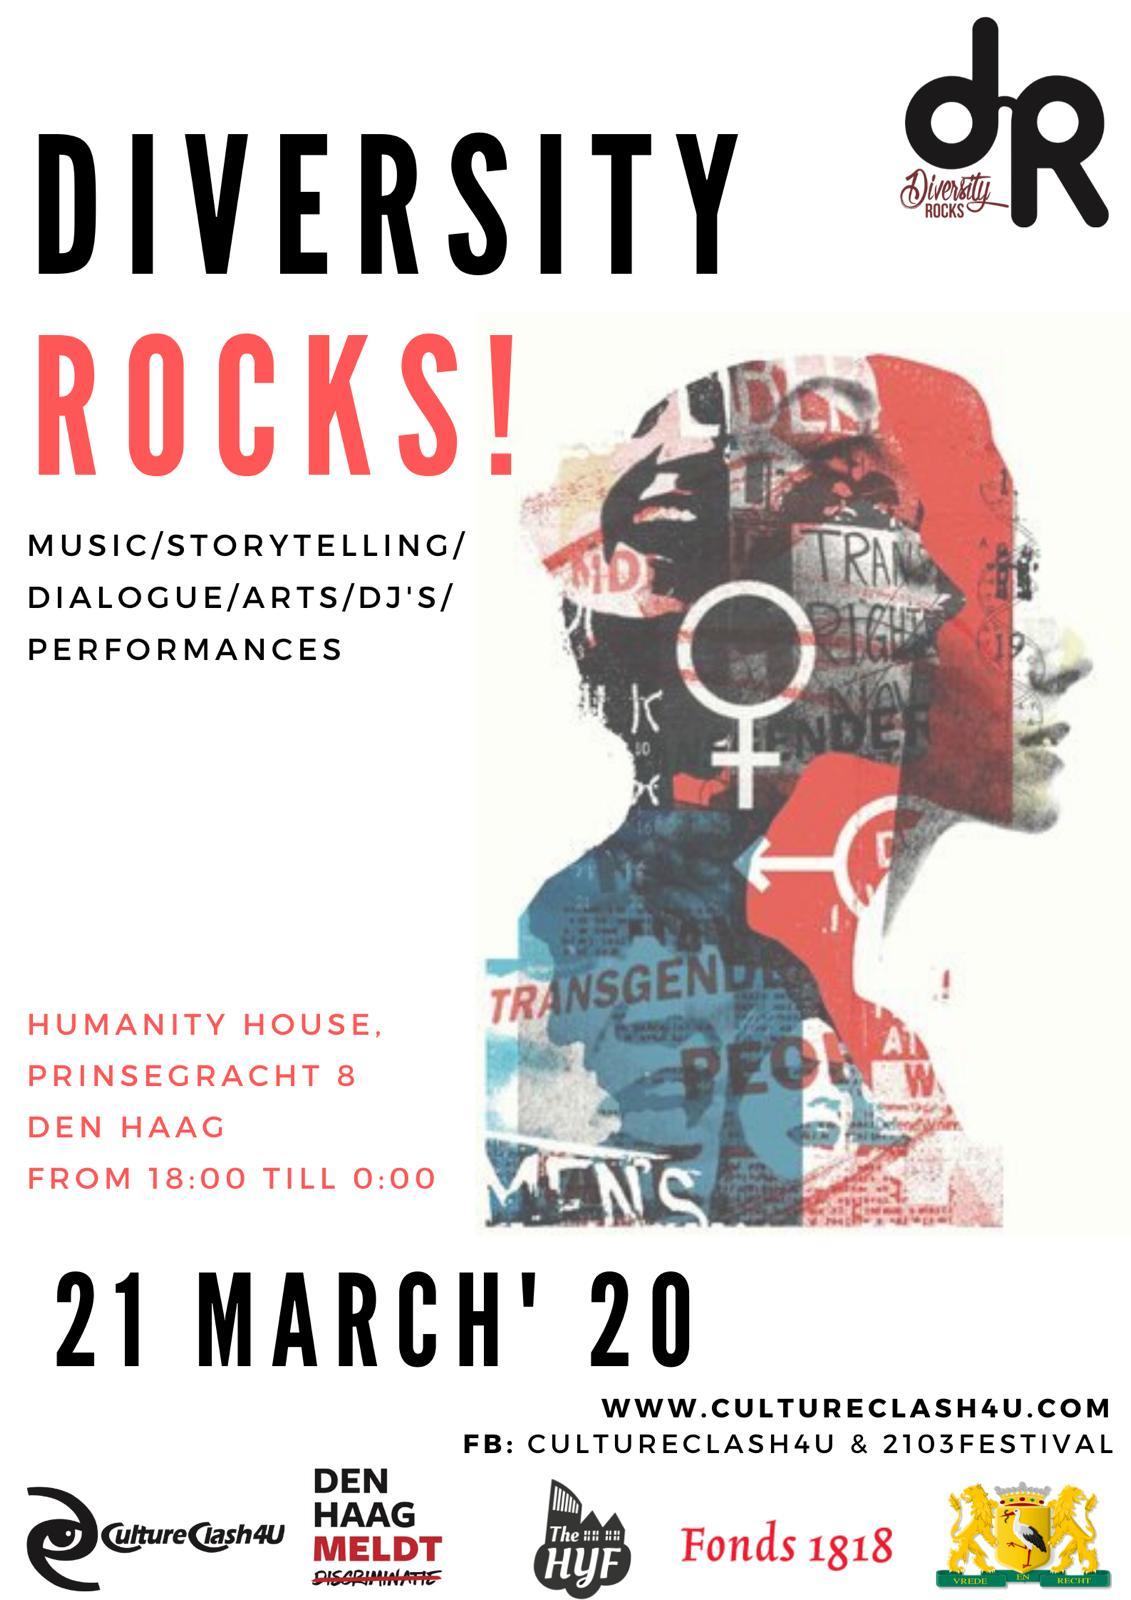 Culture Clash 4U, Humanity house. Event: Diversity Rocks